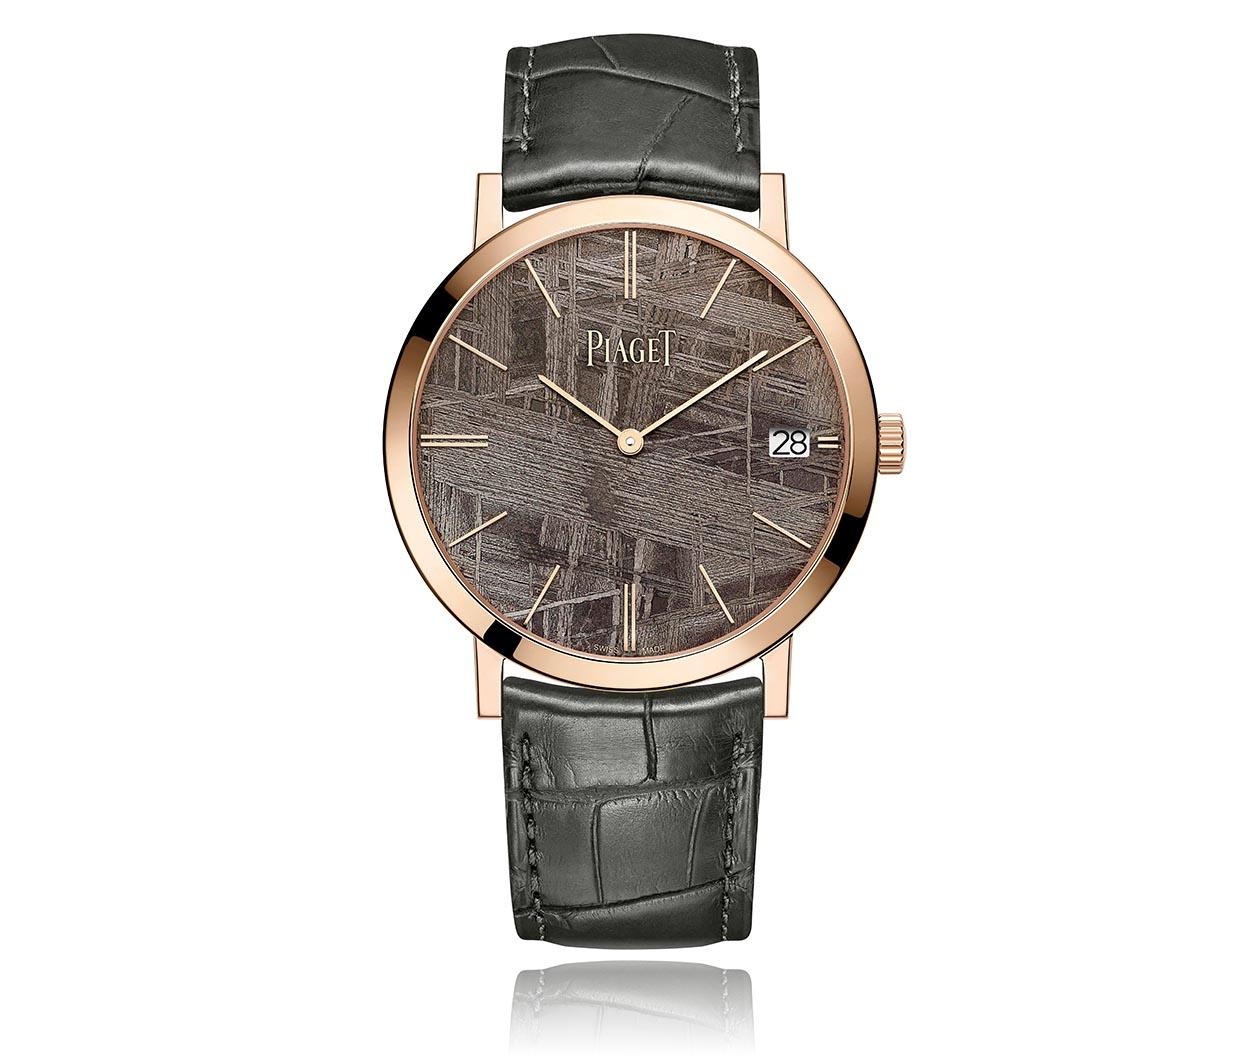 Piaget Altiplano watch G0A44051 Carousel 1 FINAL